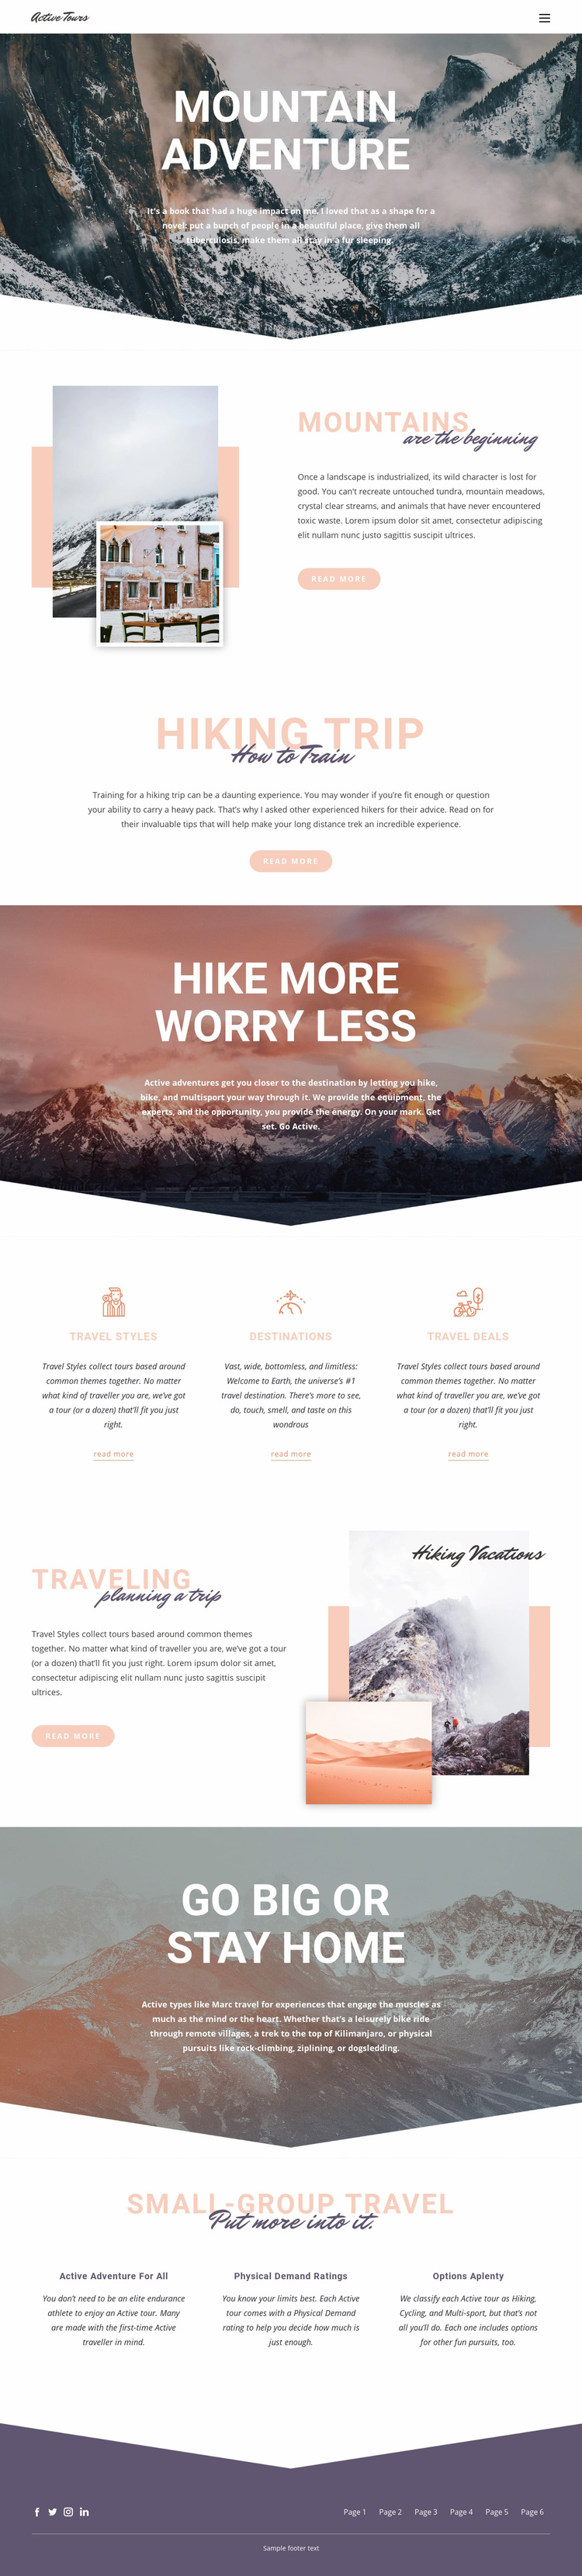 Mountain Adventure Web Page Designer